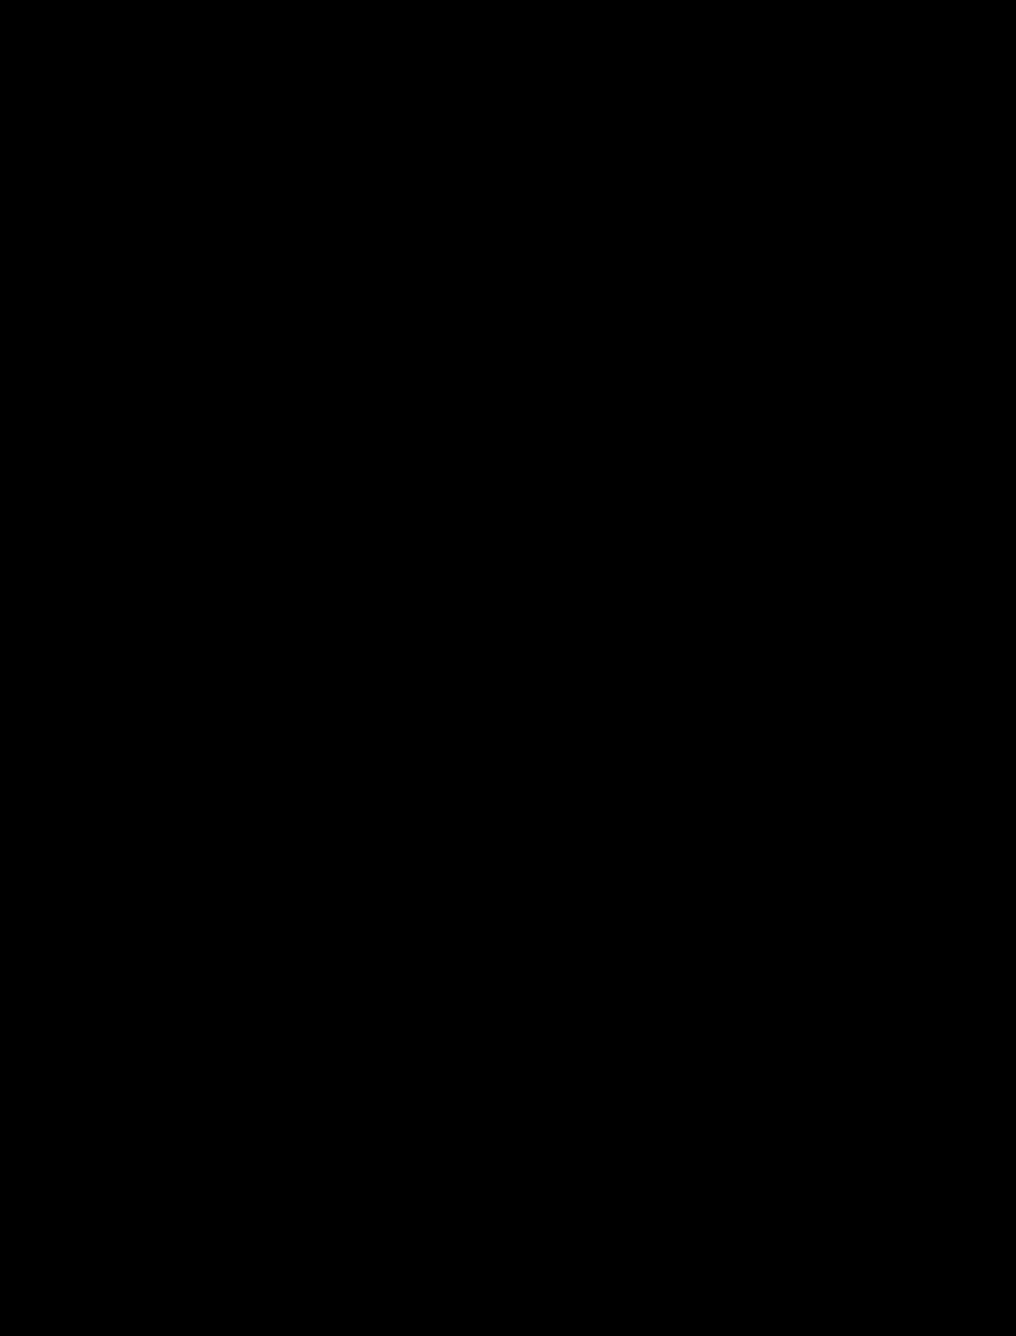 Flasklogo